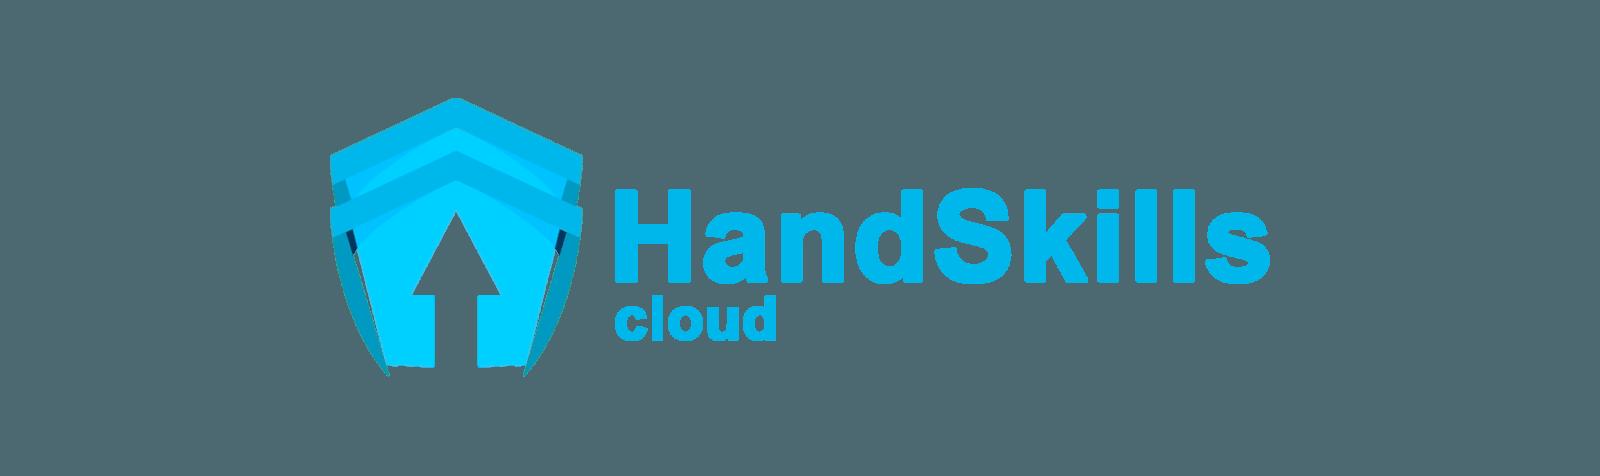 HandSkills Cloud